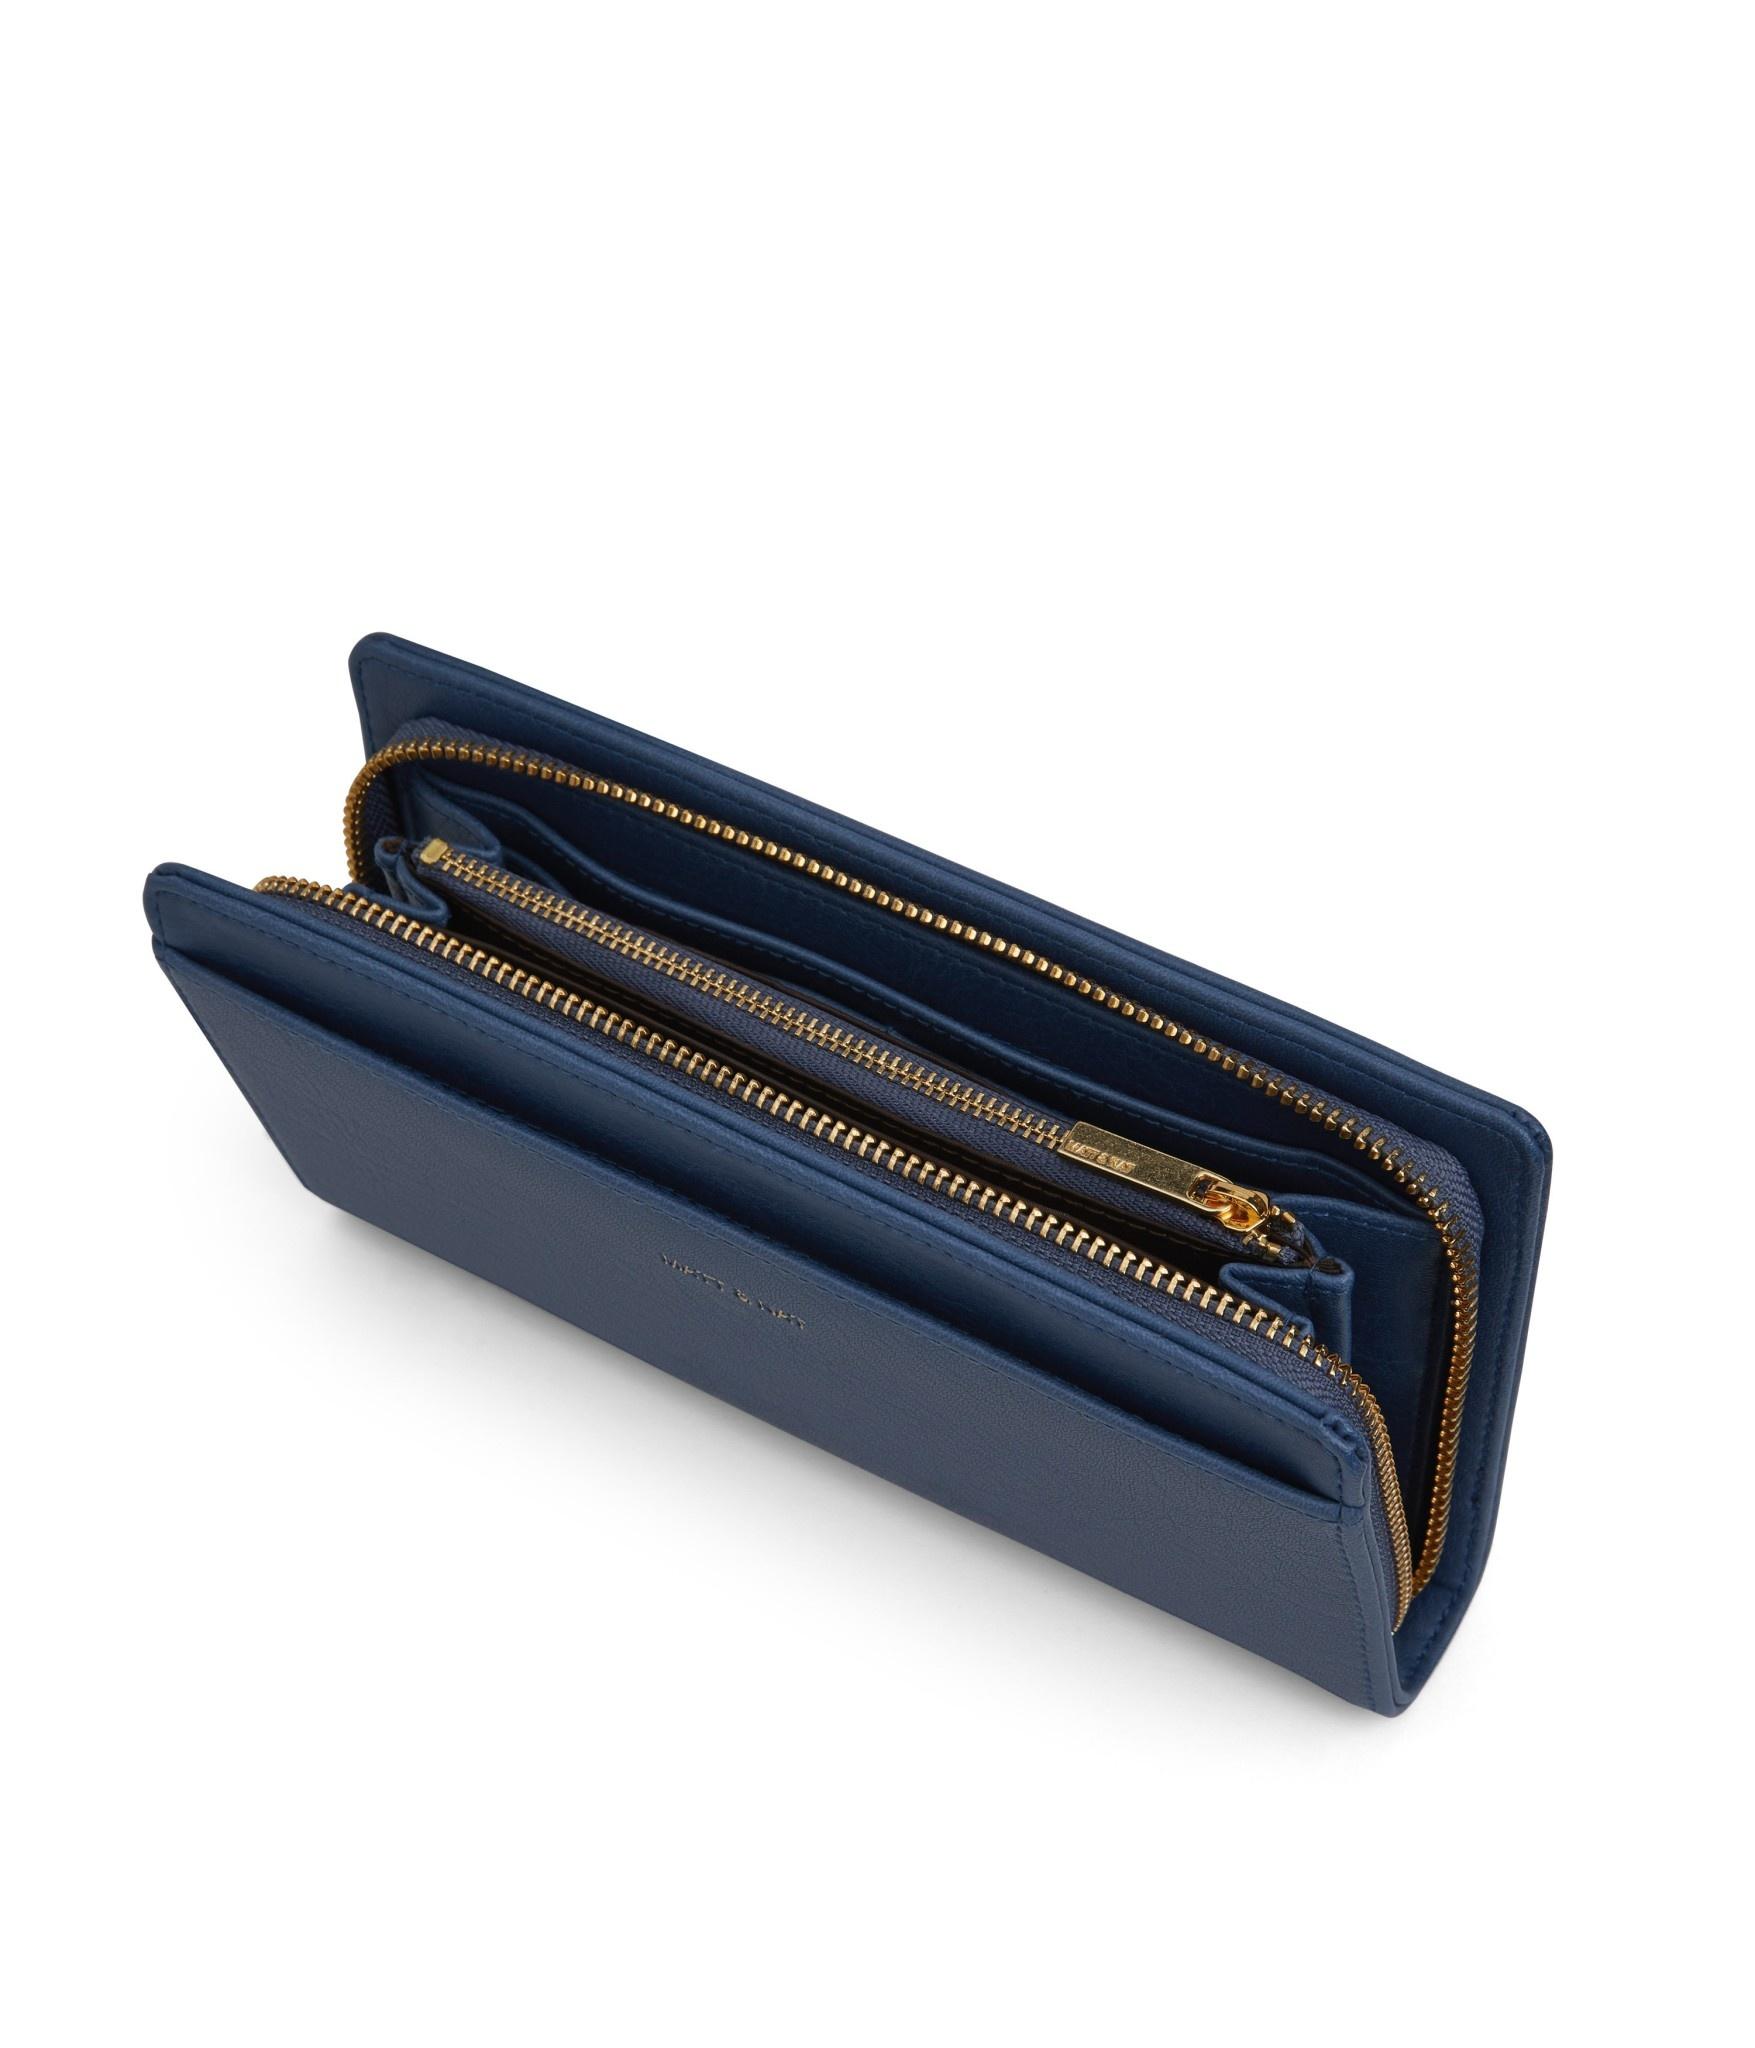 Webber Vintage Wallet Cosmo Blue-2